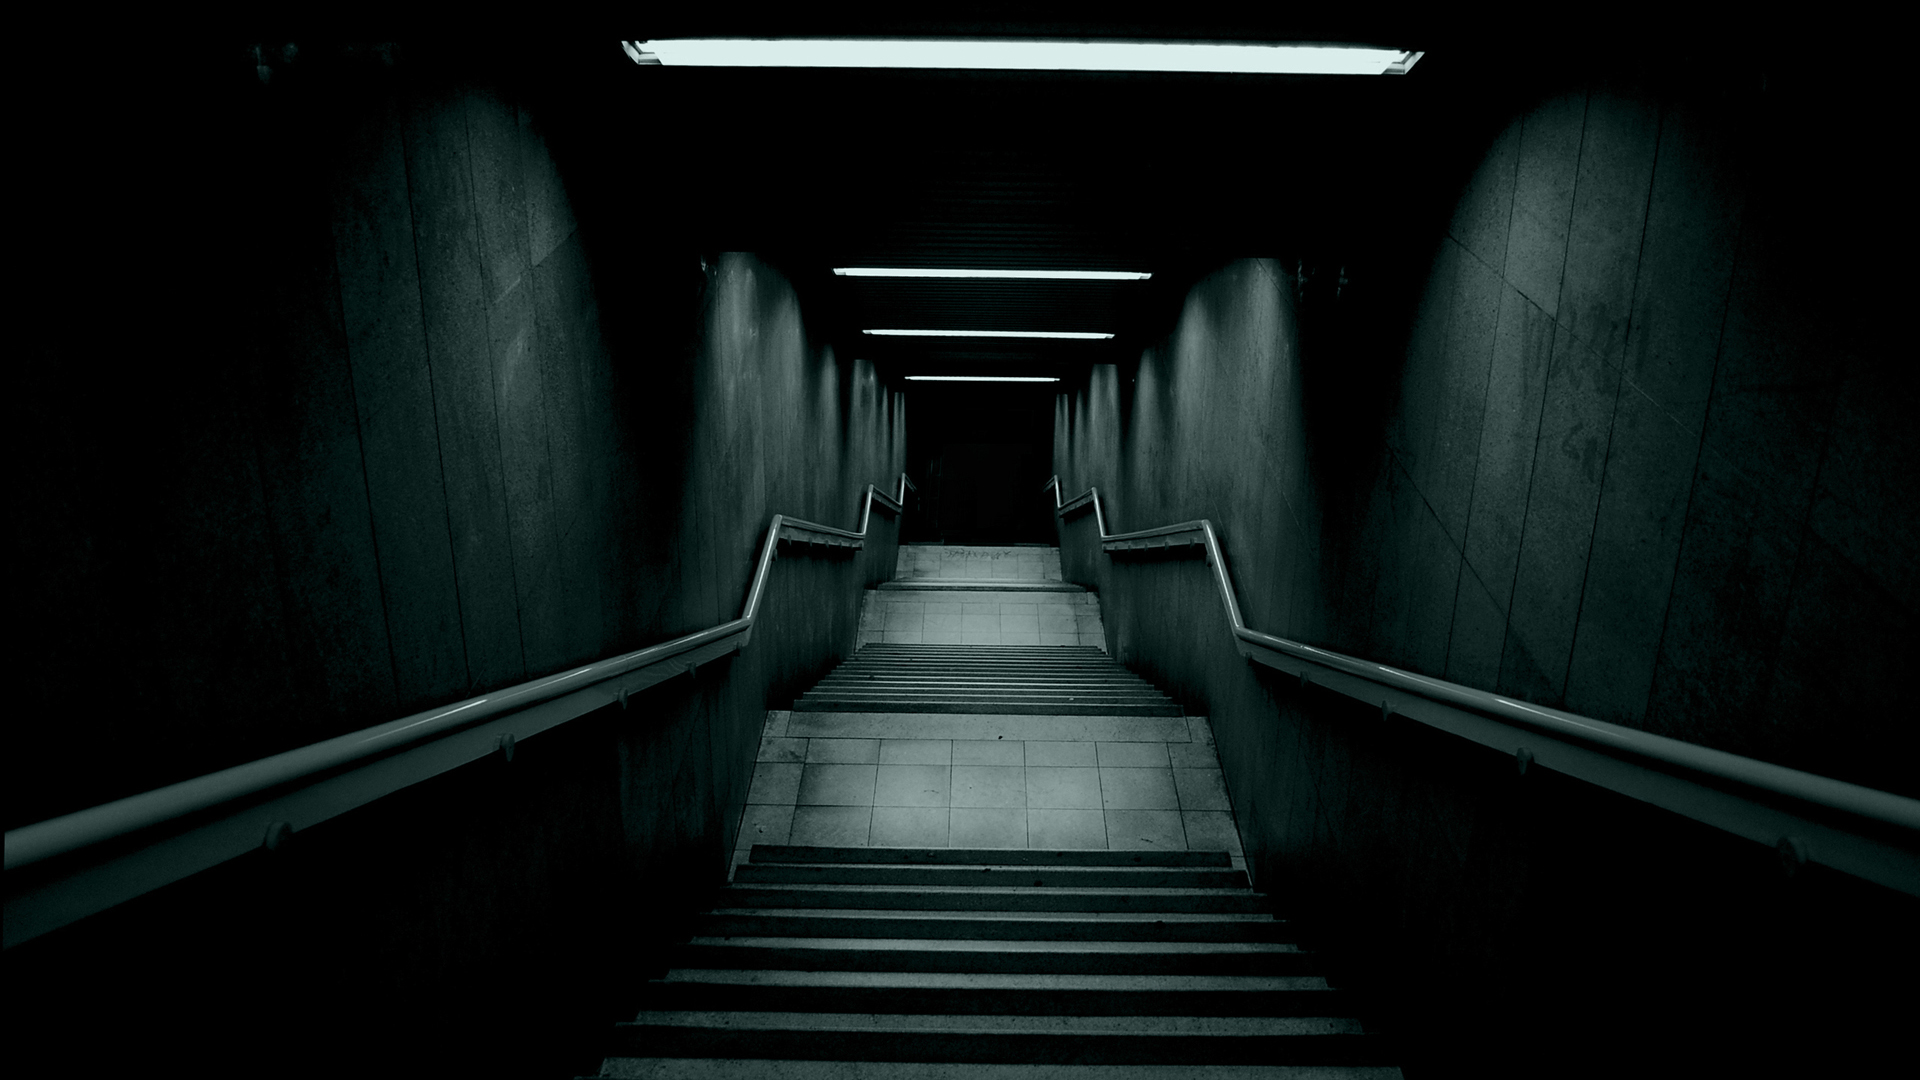 stariways hd dark wallpapers